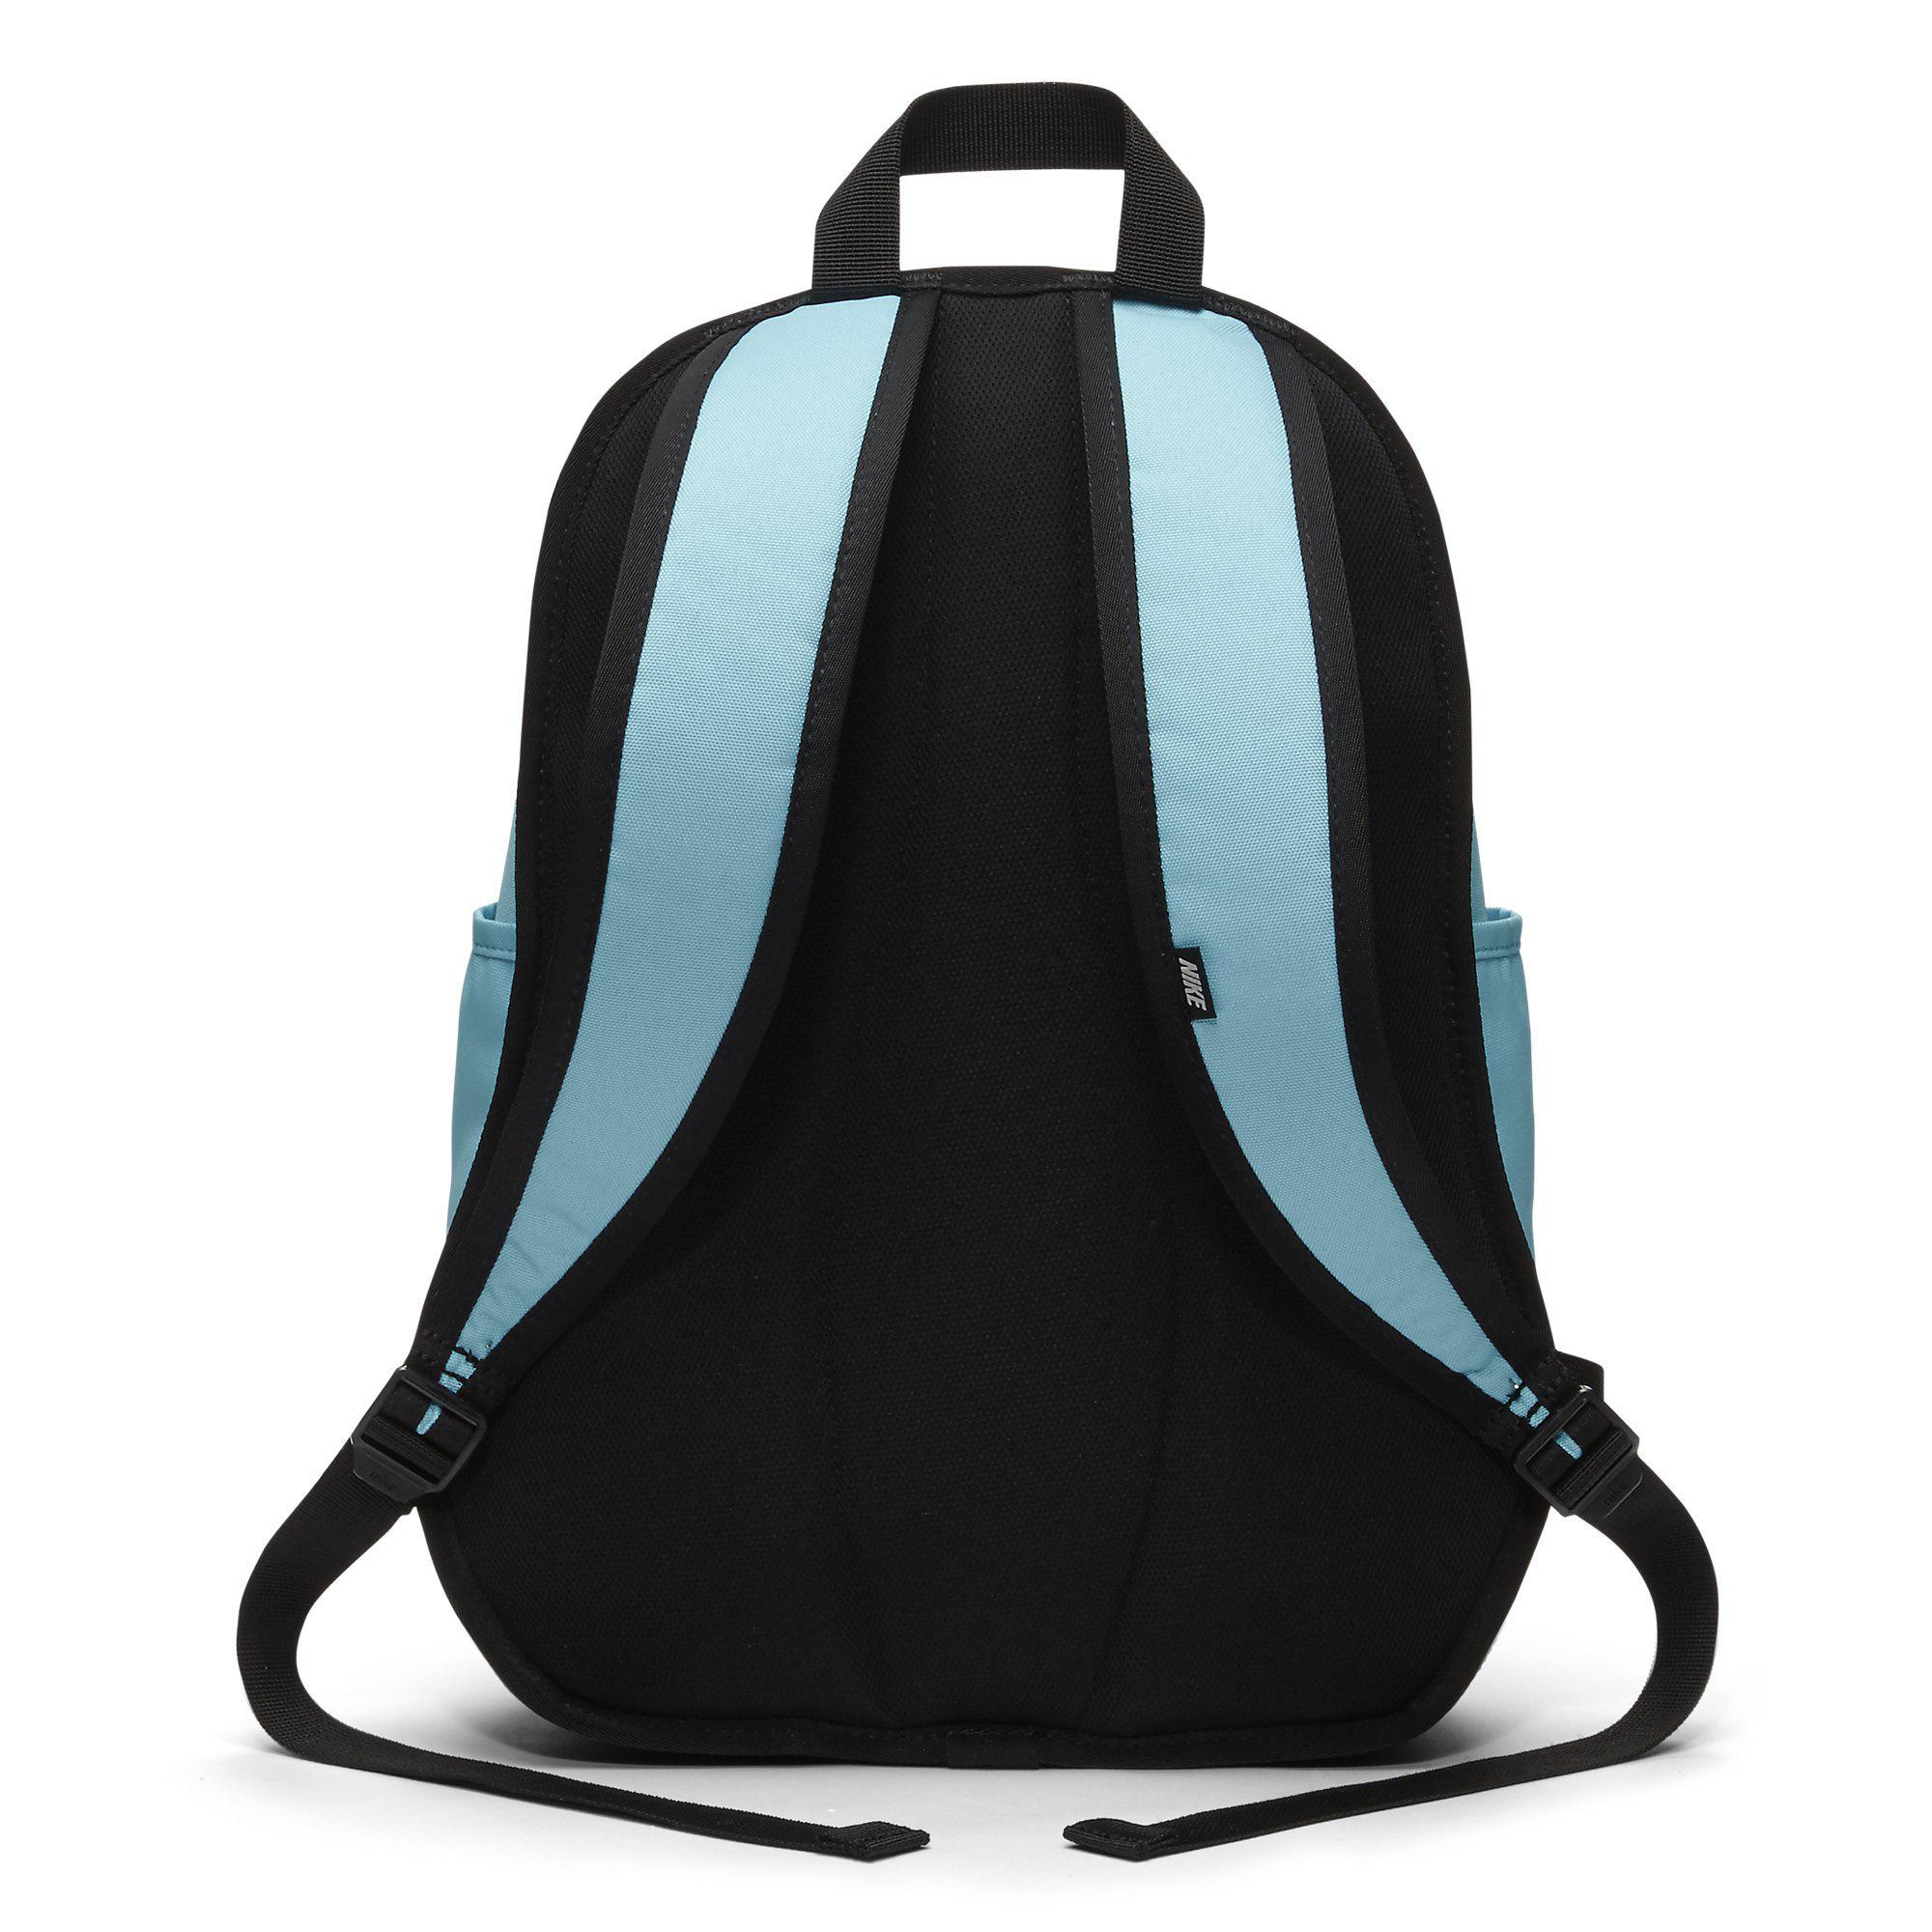 Nike Cheyenne Solid Kids Backpack - Polarized Blue - Tennisnuts.com 4c305bb74d8a7